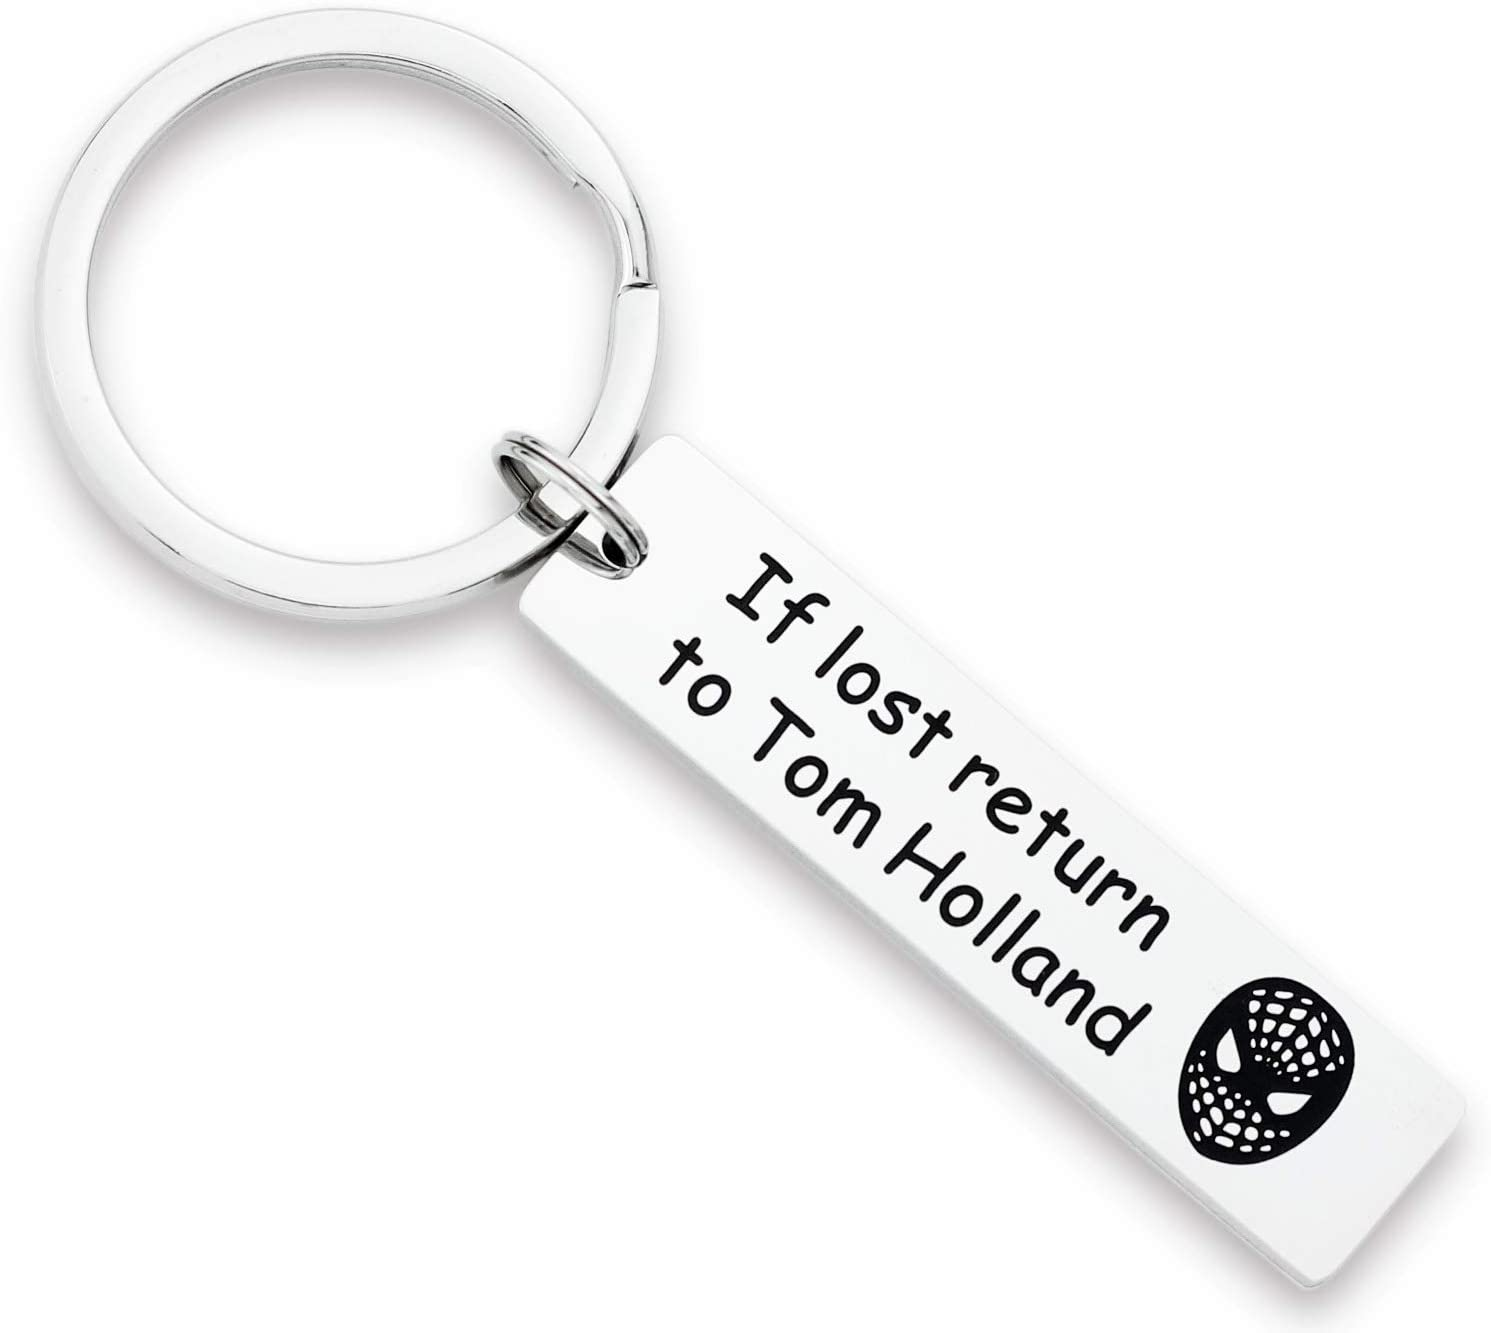 Kivosliviz Spiderman Keychain If Lost Return to Tom Holland Gifts for Girls and Son